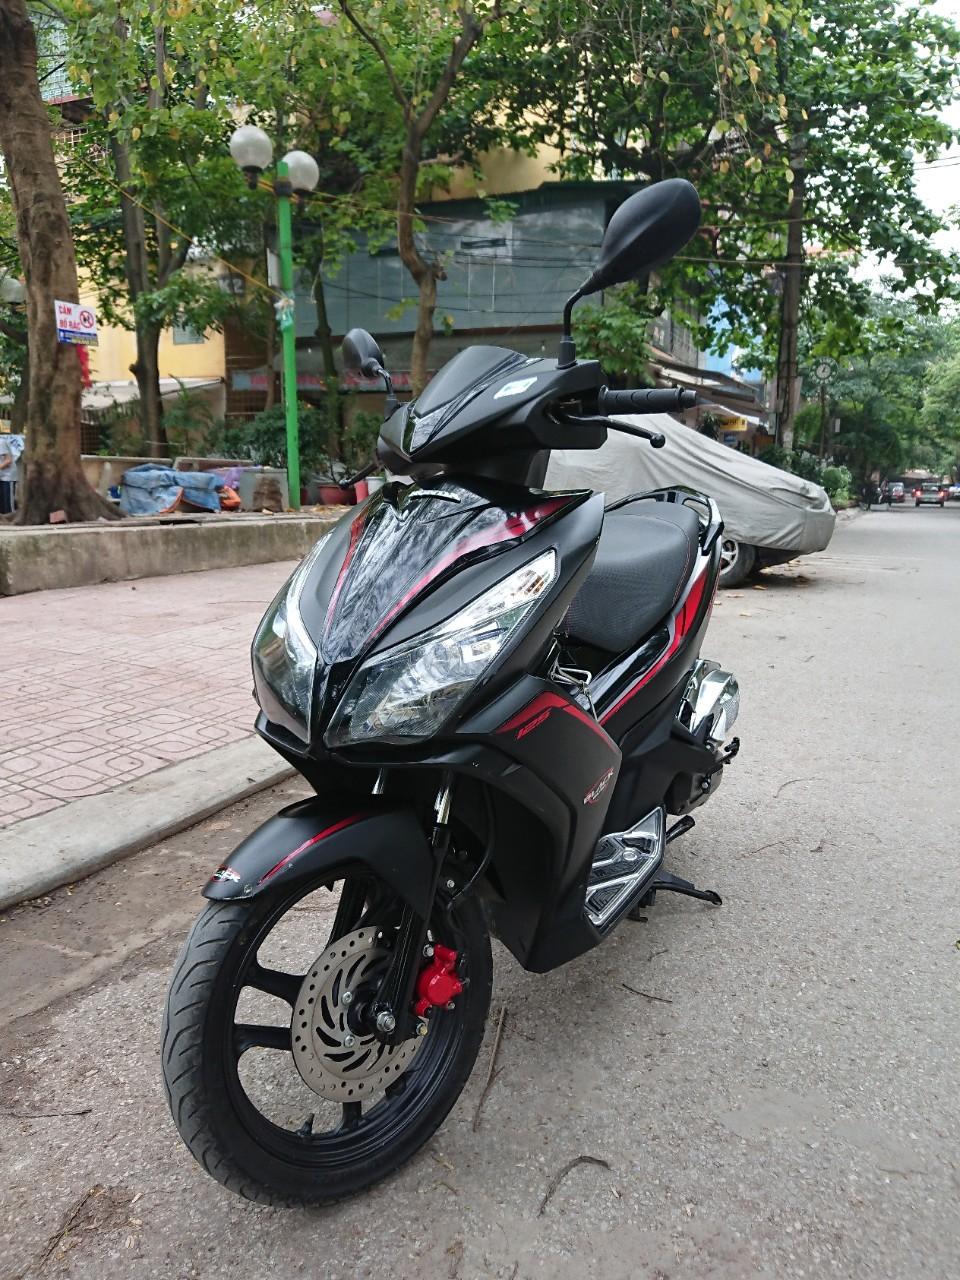 Rao ban Honda Air blade 125fi Black Edition den mo chinh chu - 5